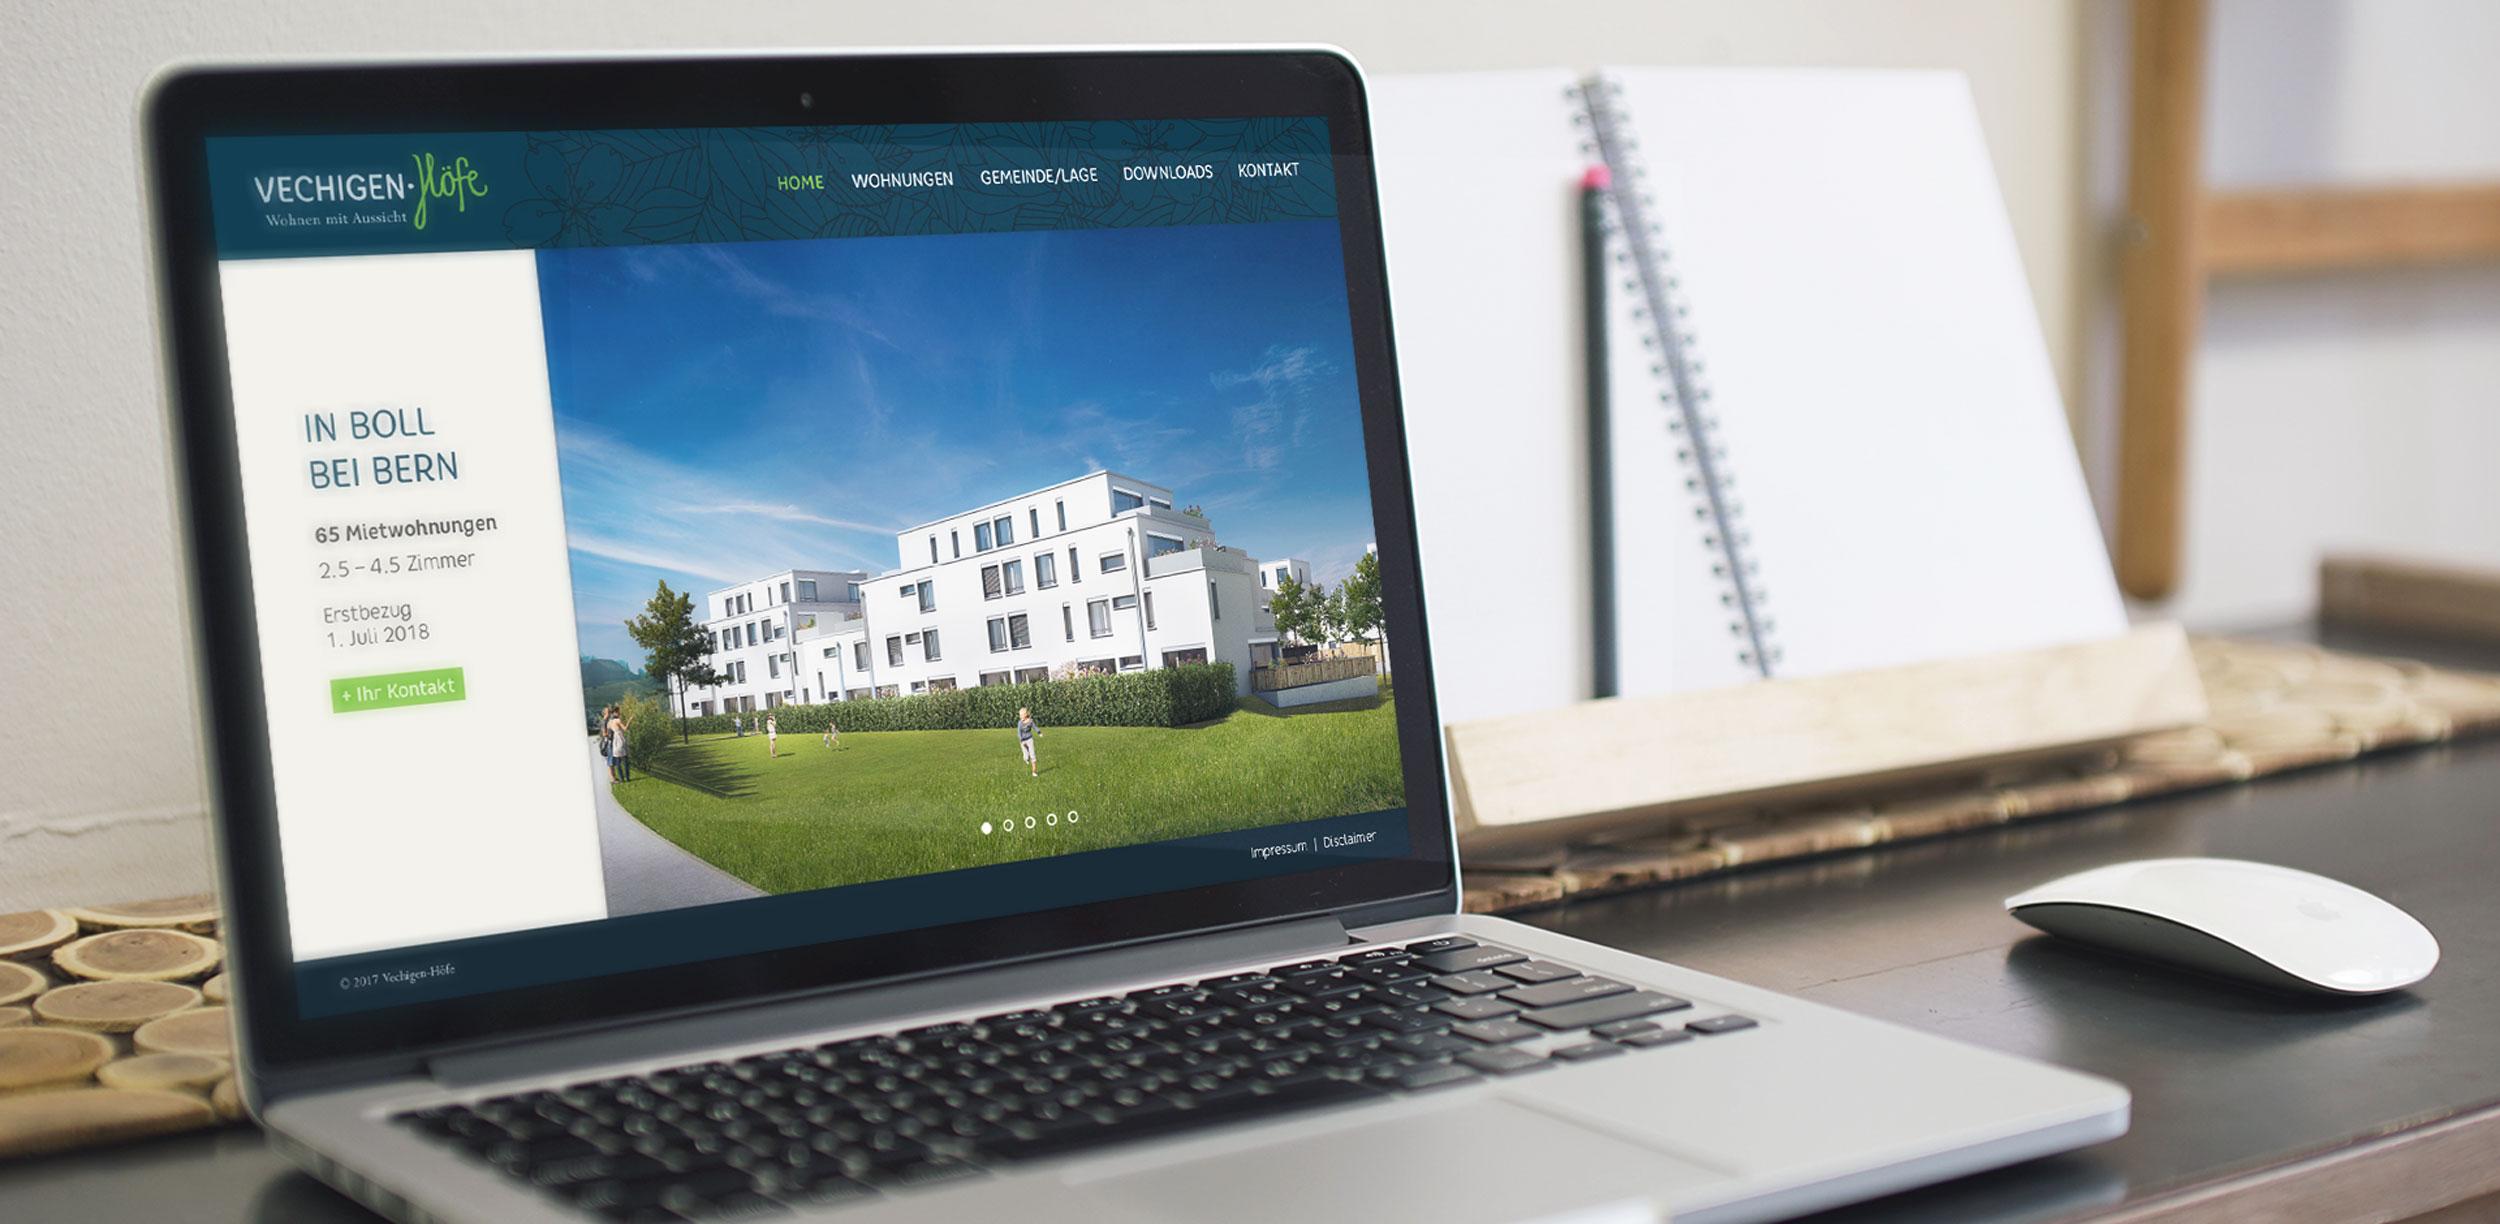 Vechigen Höfe website GPU Design